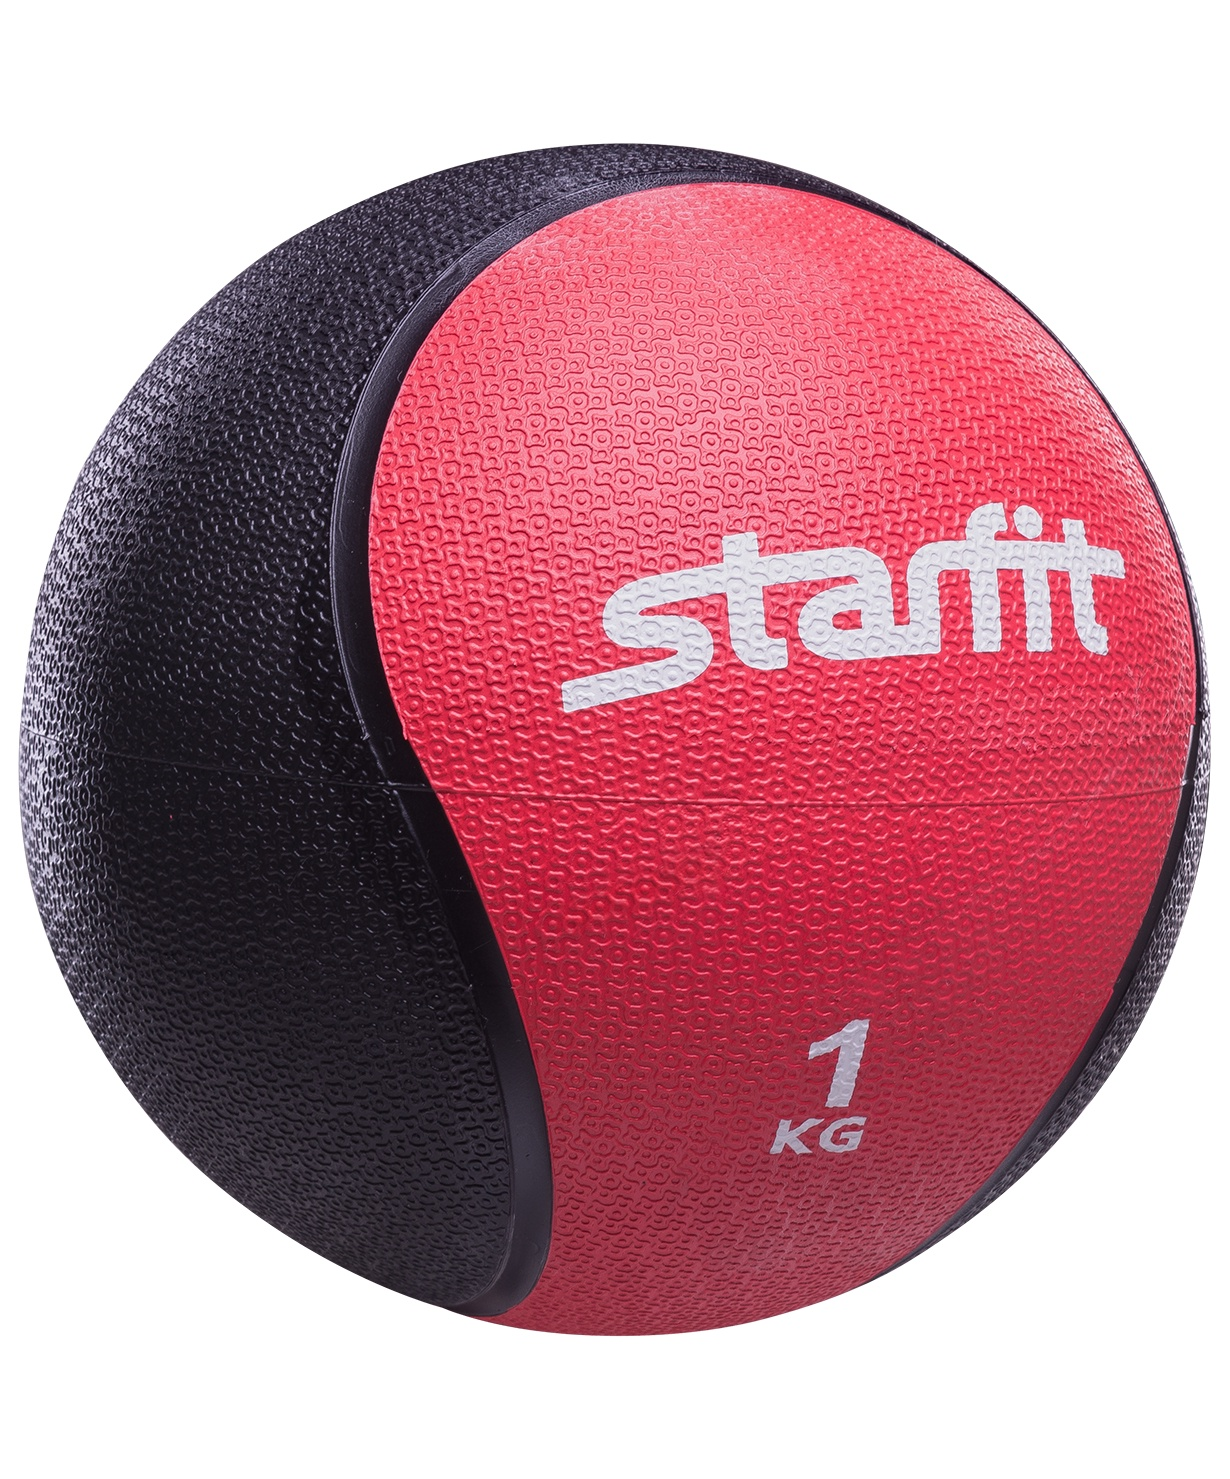 Медбол STARFIT Pro GB-702, 1 кг, красный 1/6